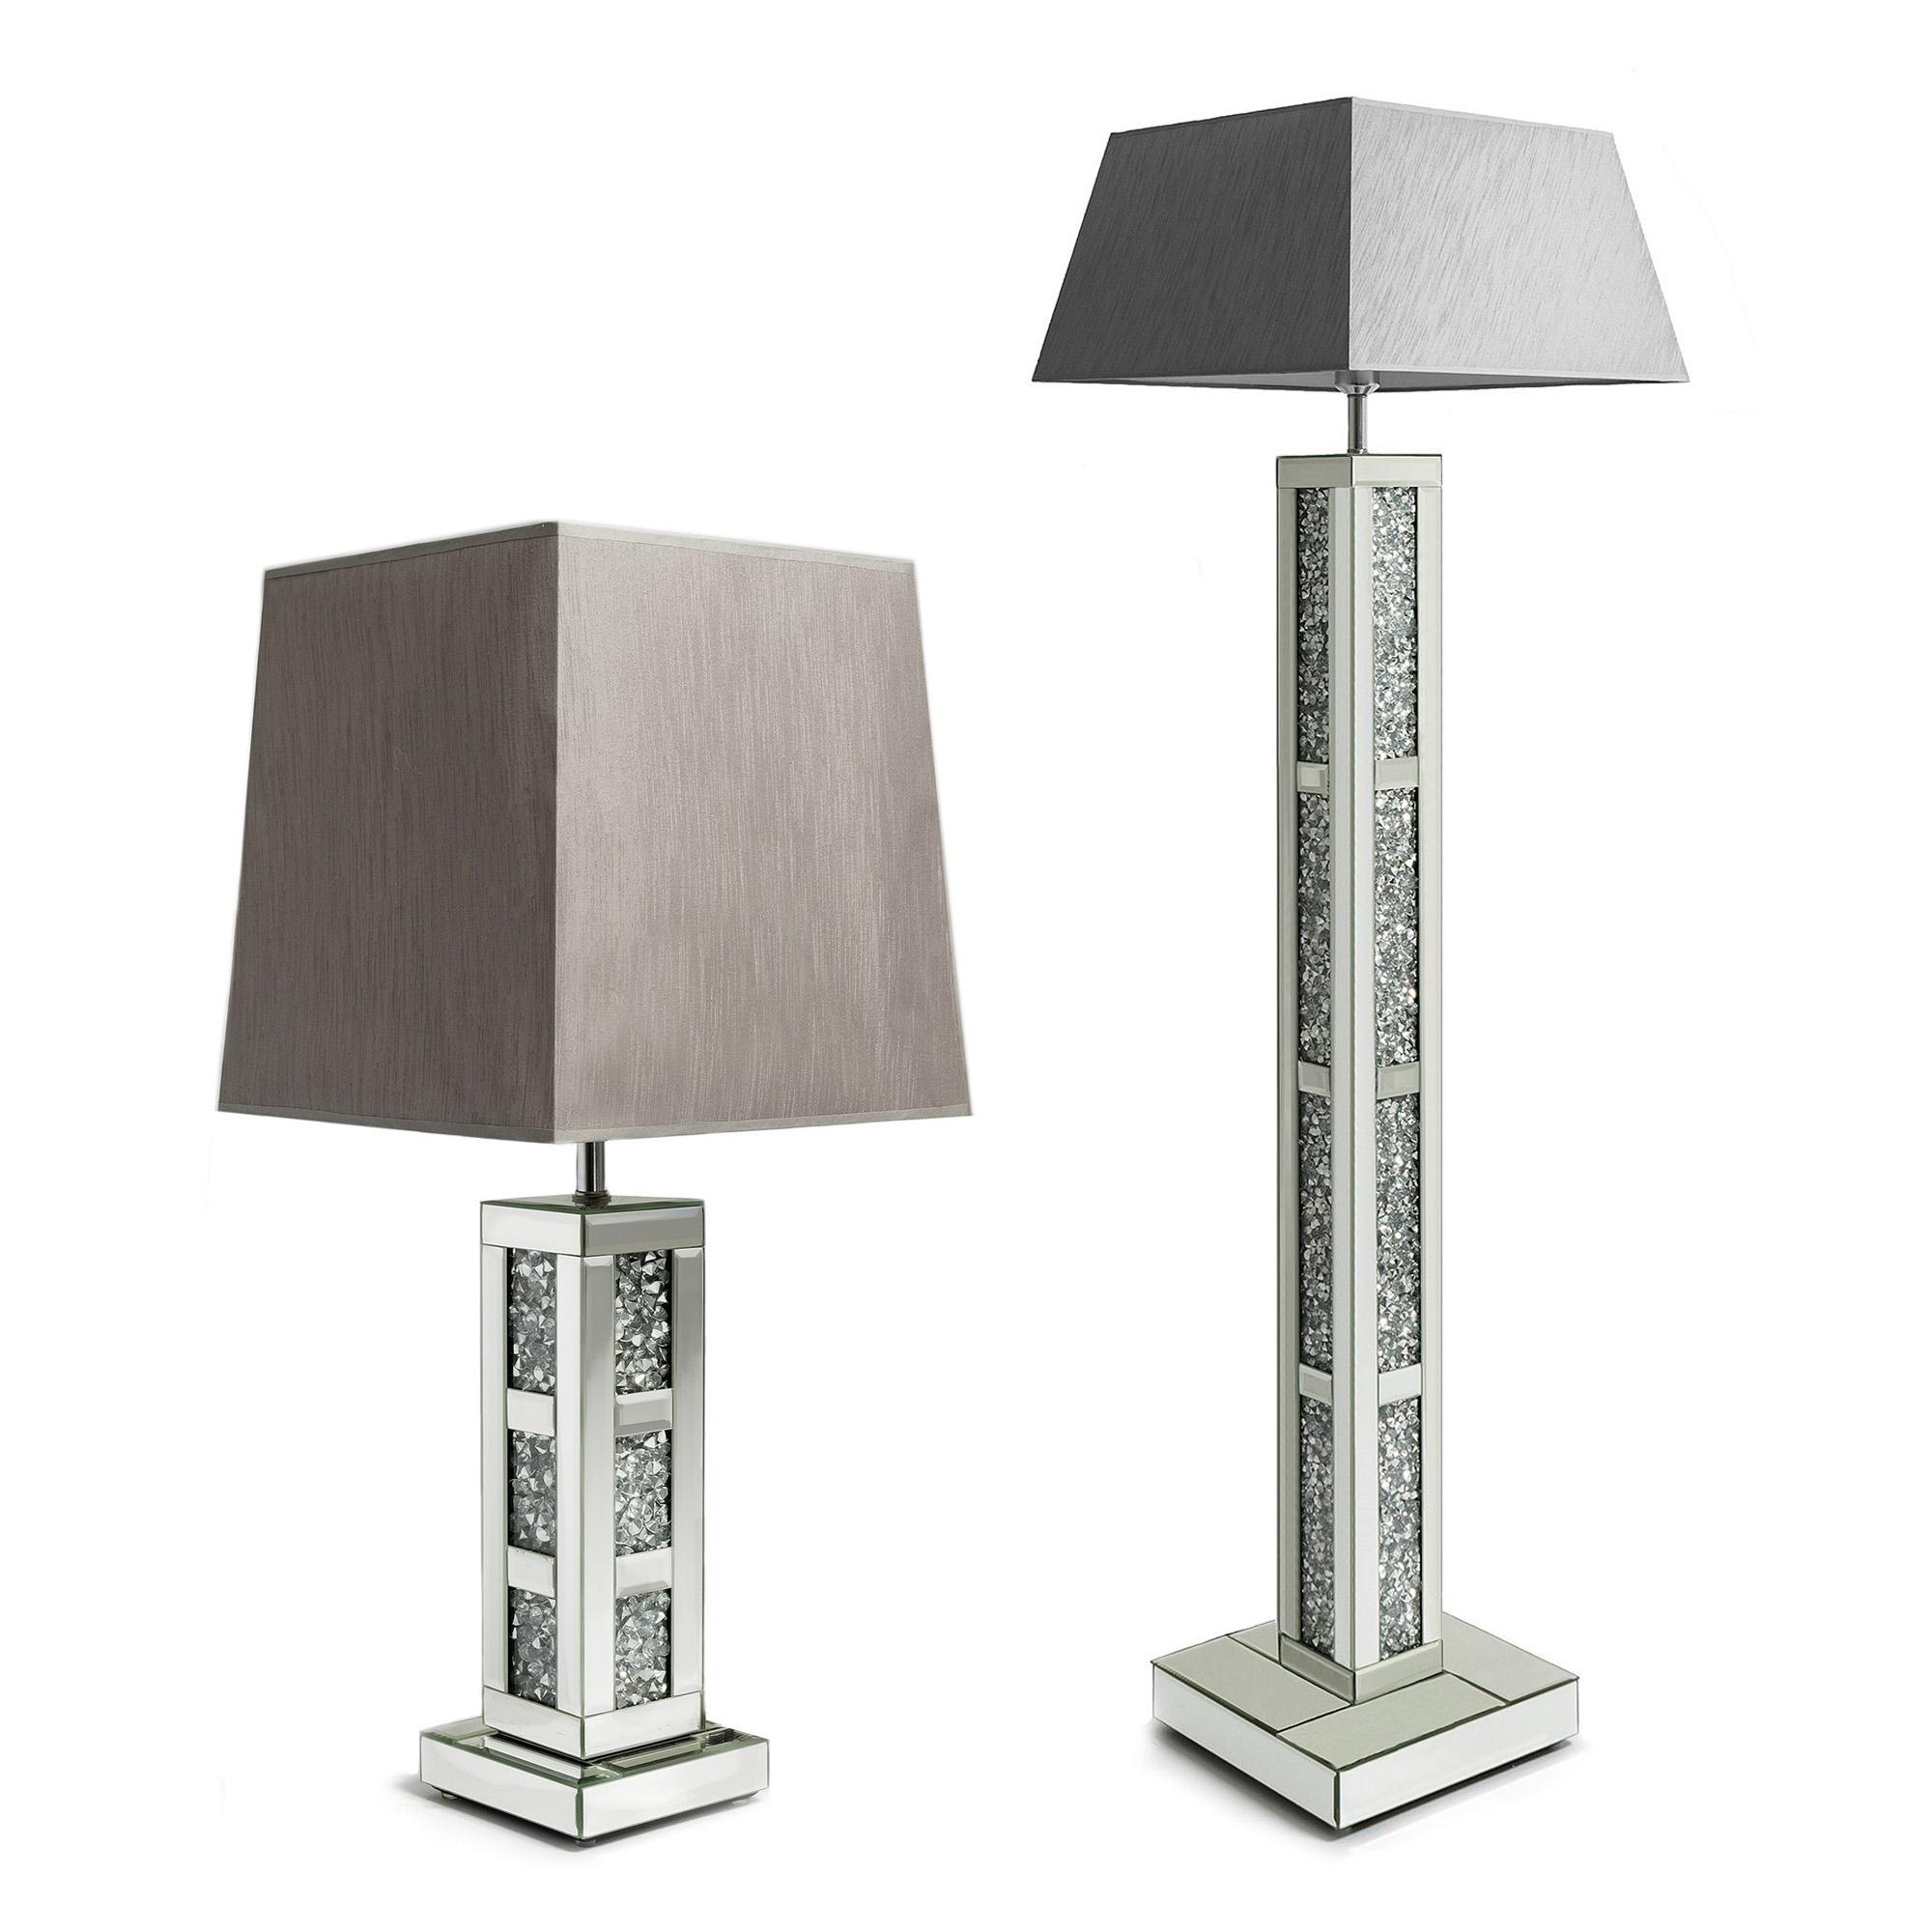 Diamond Crush Table Mocka Bar Lamp zVLqMSUpG